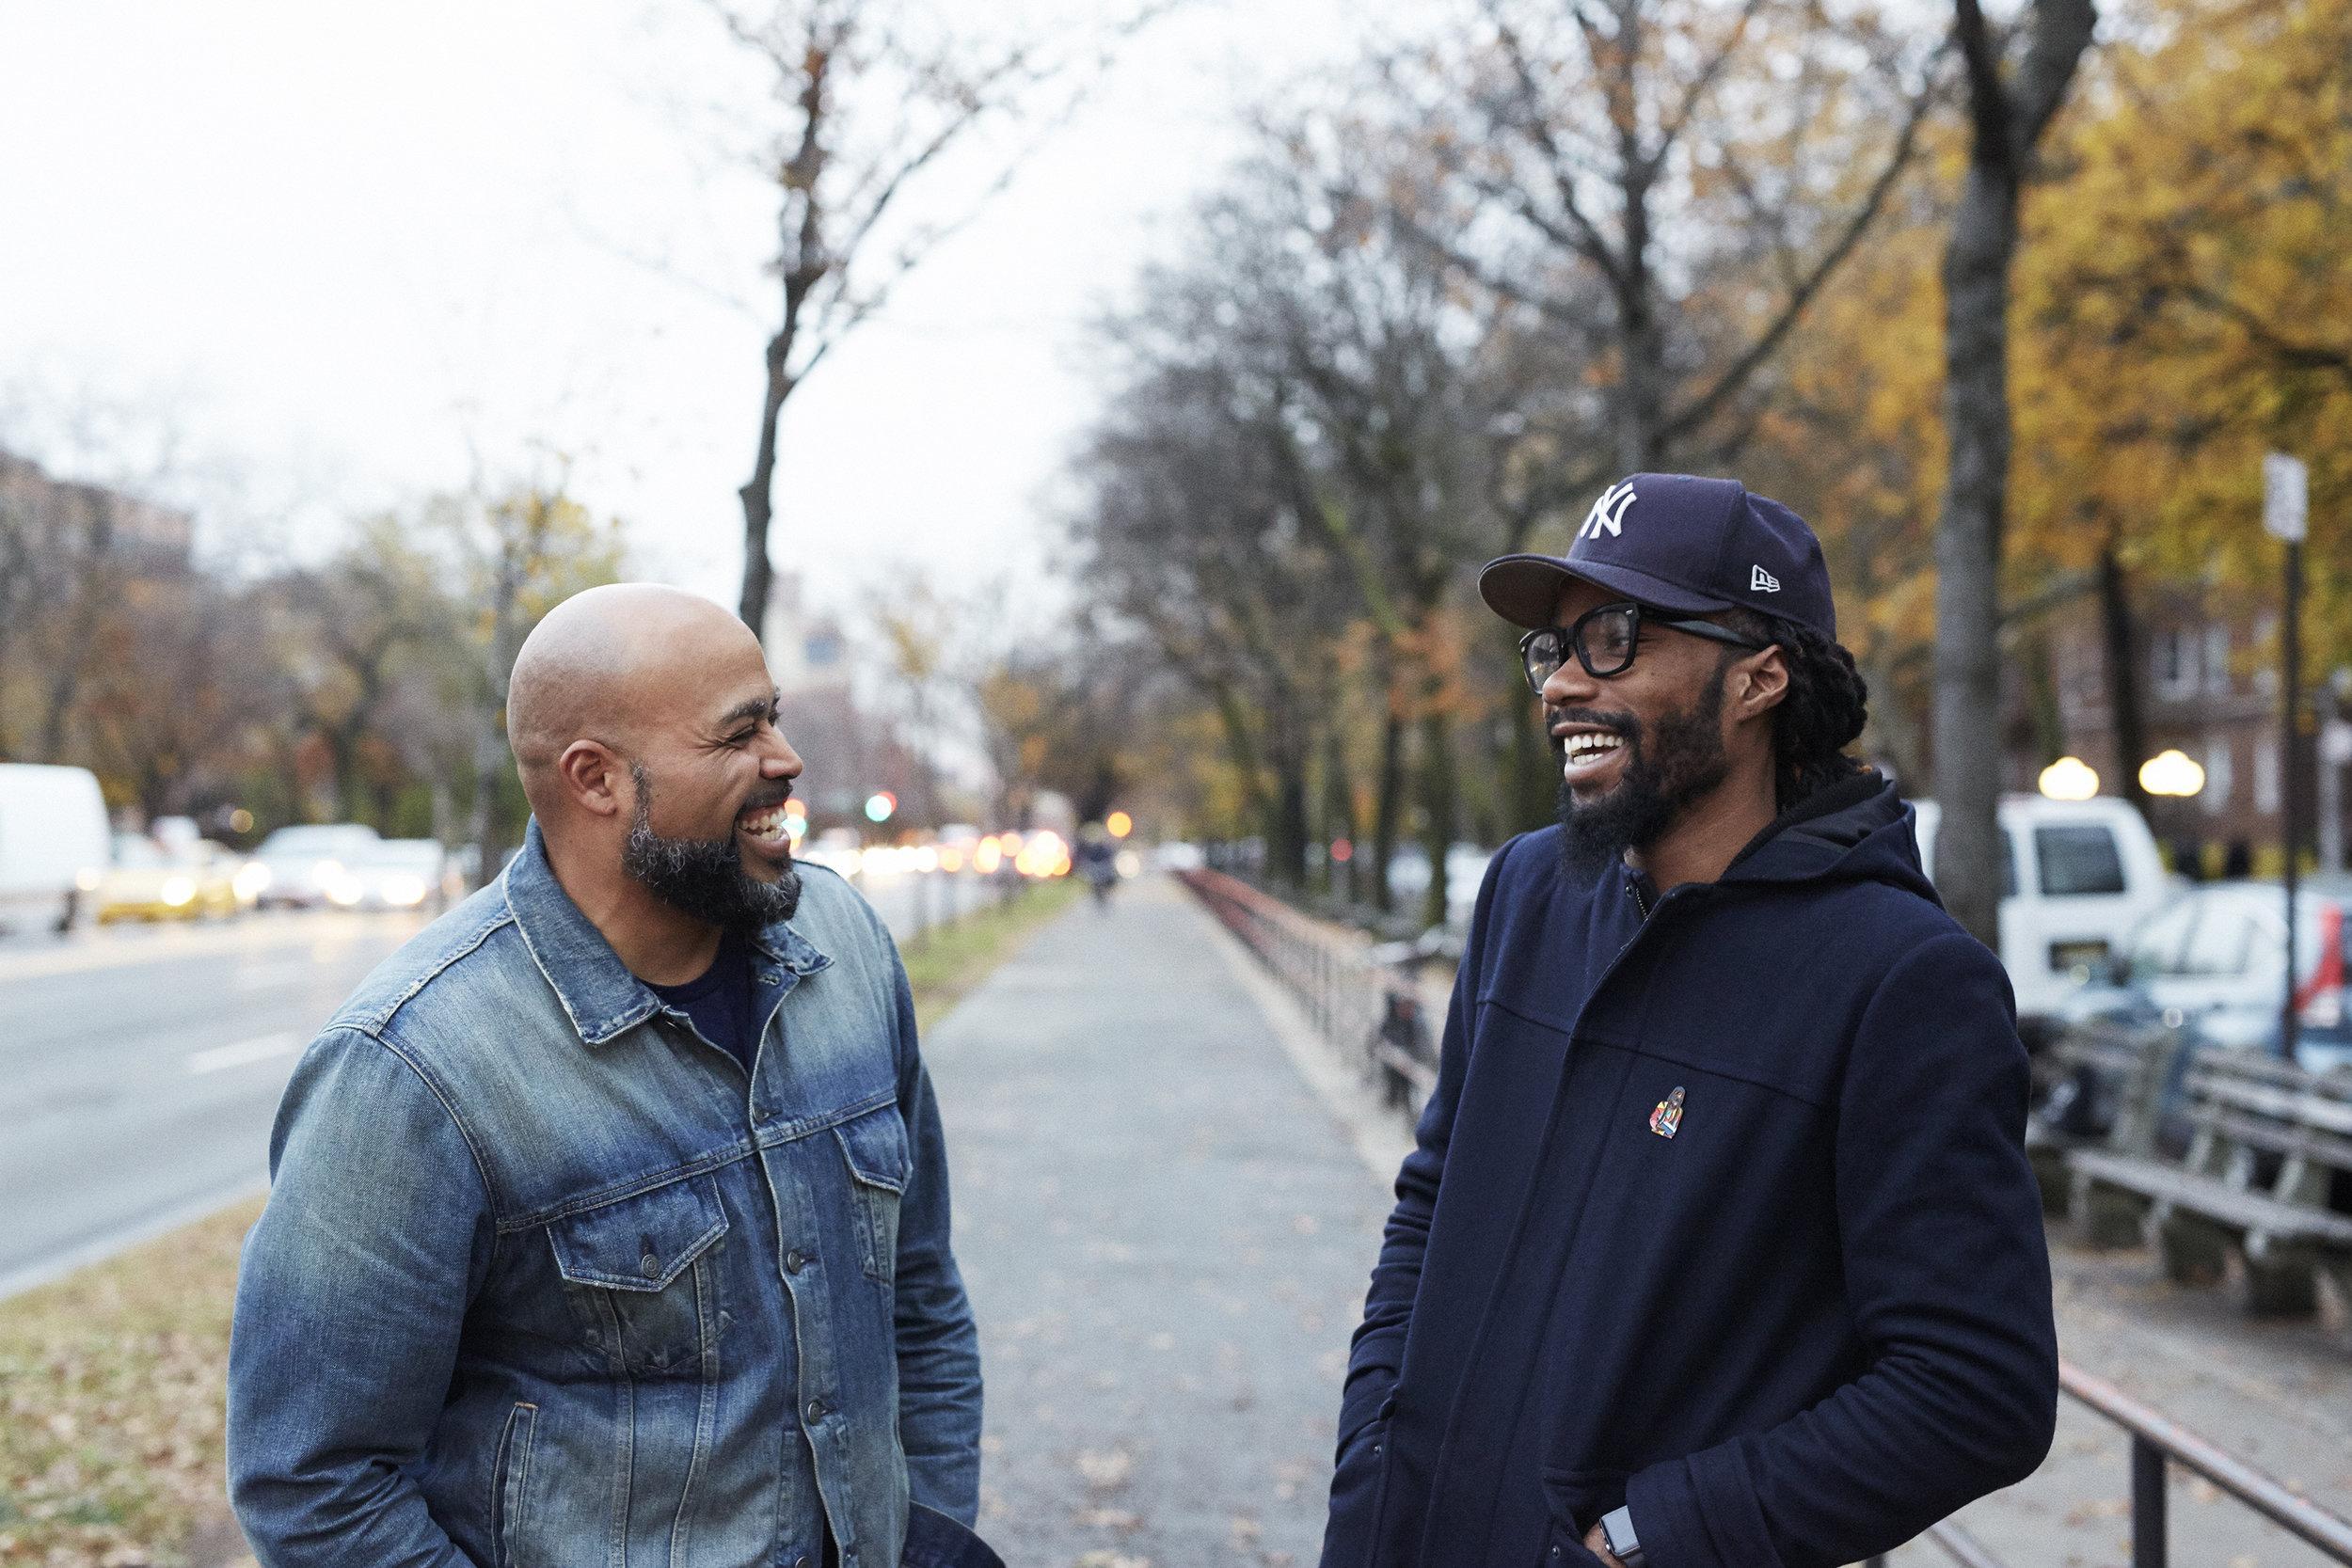 Lenny and Yahdon share a last laugh.